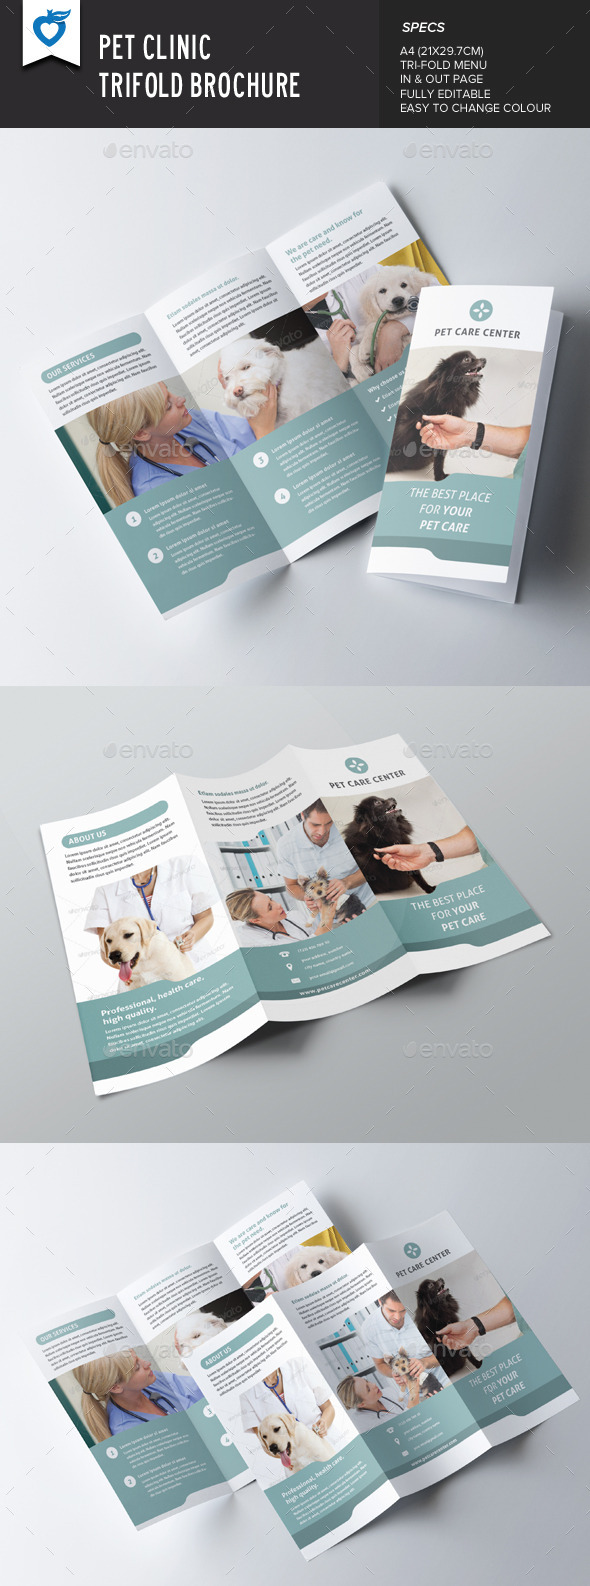 GraphicRiver Pet Clinic Trifold Brochure 9597013